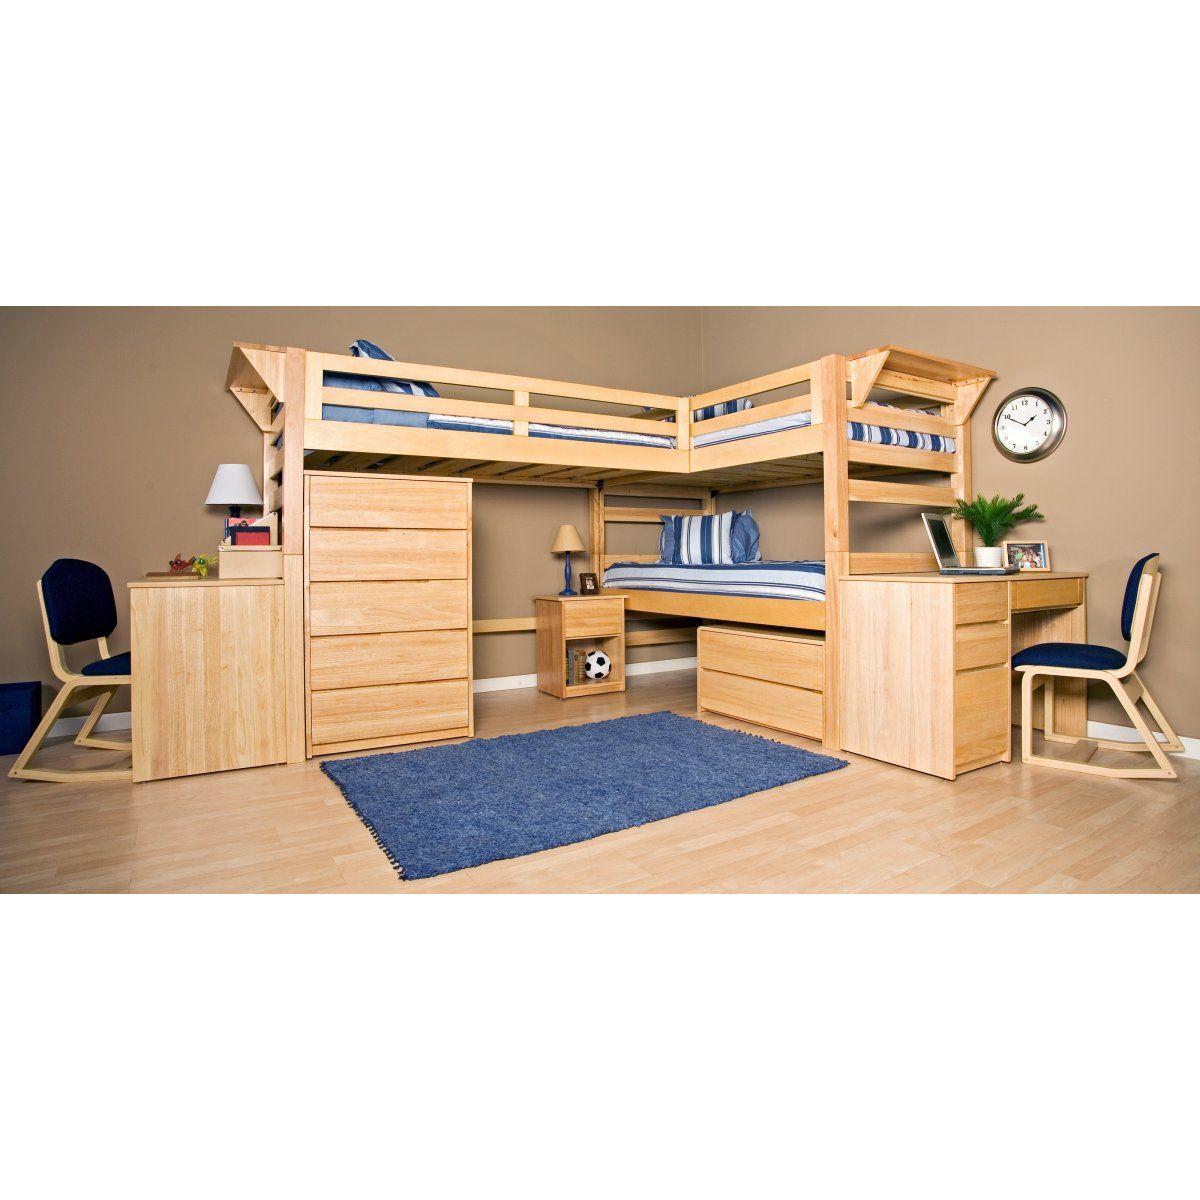 Double loft bed with desk  headboard idea children loft bed  Google Search  Woodworking